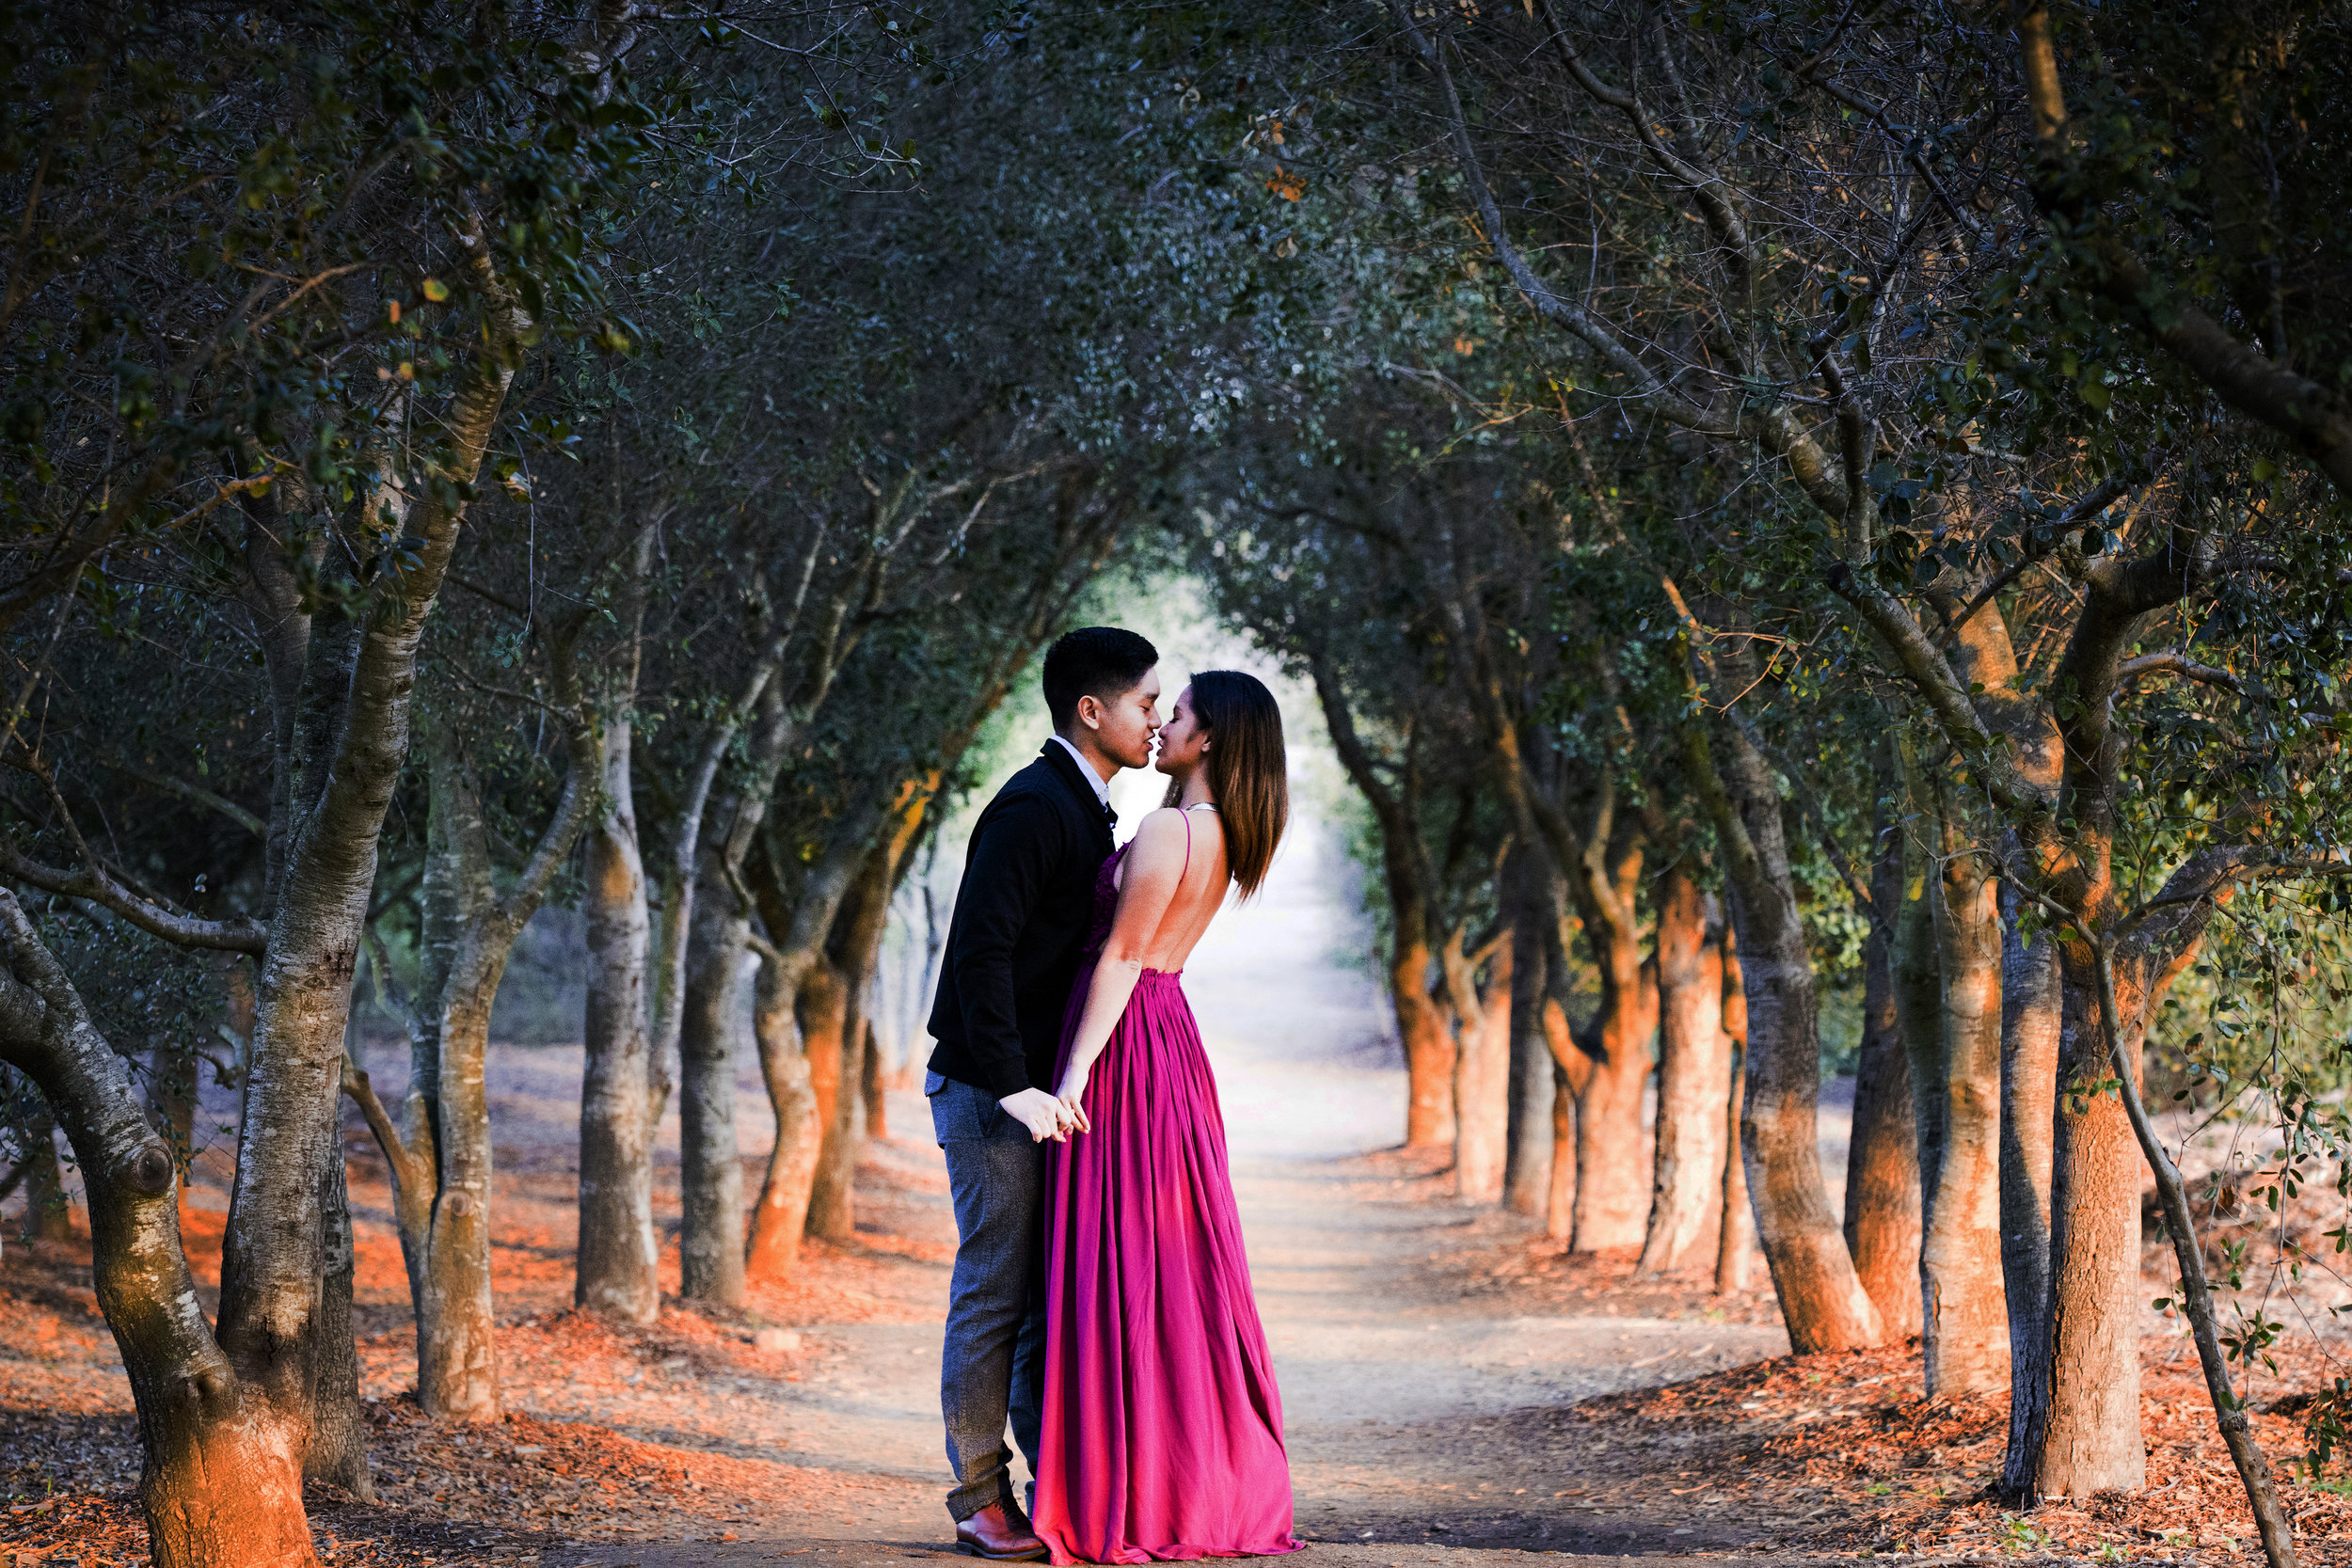 Ashley & Ritz Engagement Photoshoot (12.14.2014)_4 FINAL 70%.jpg